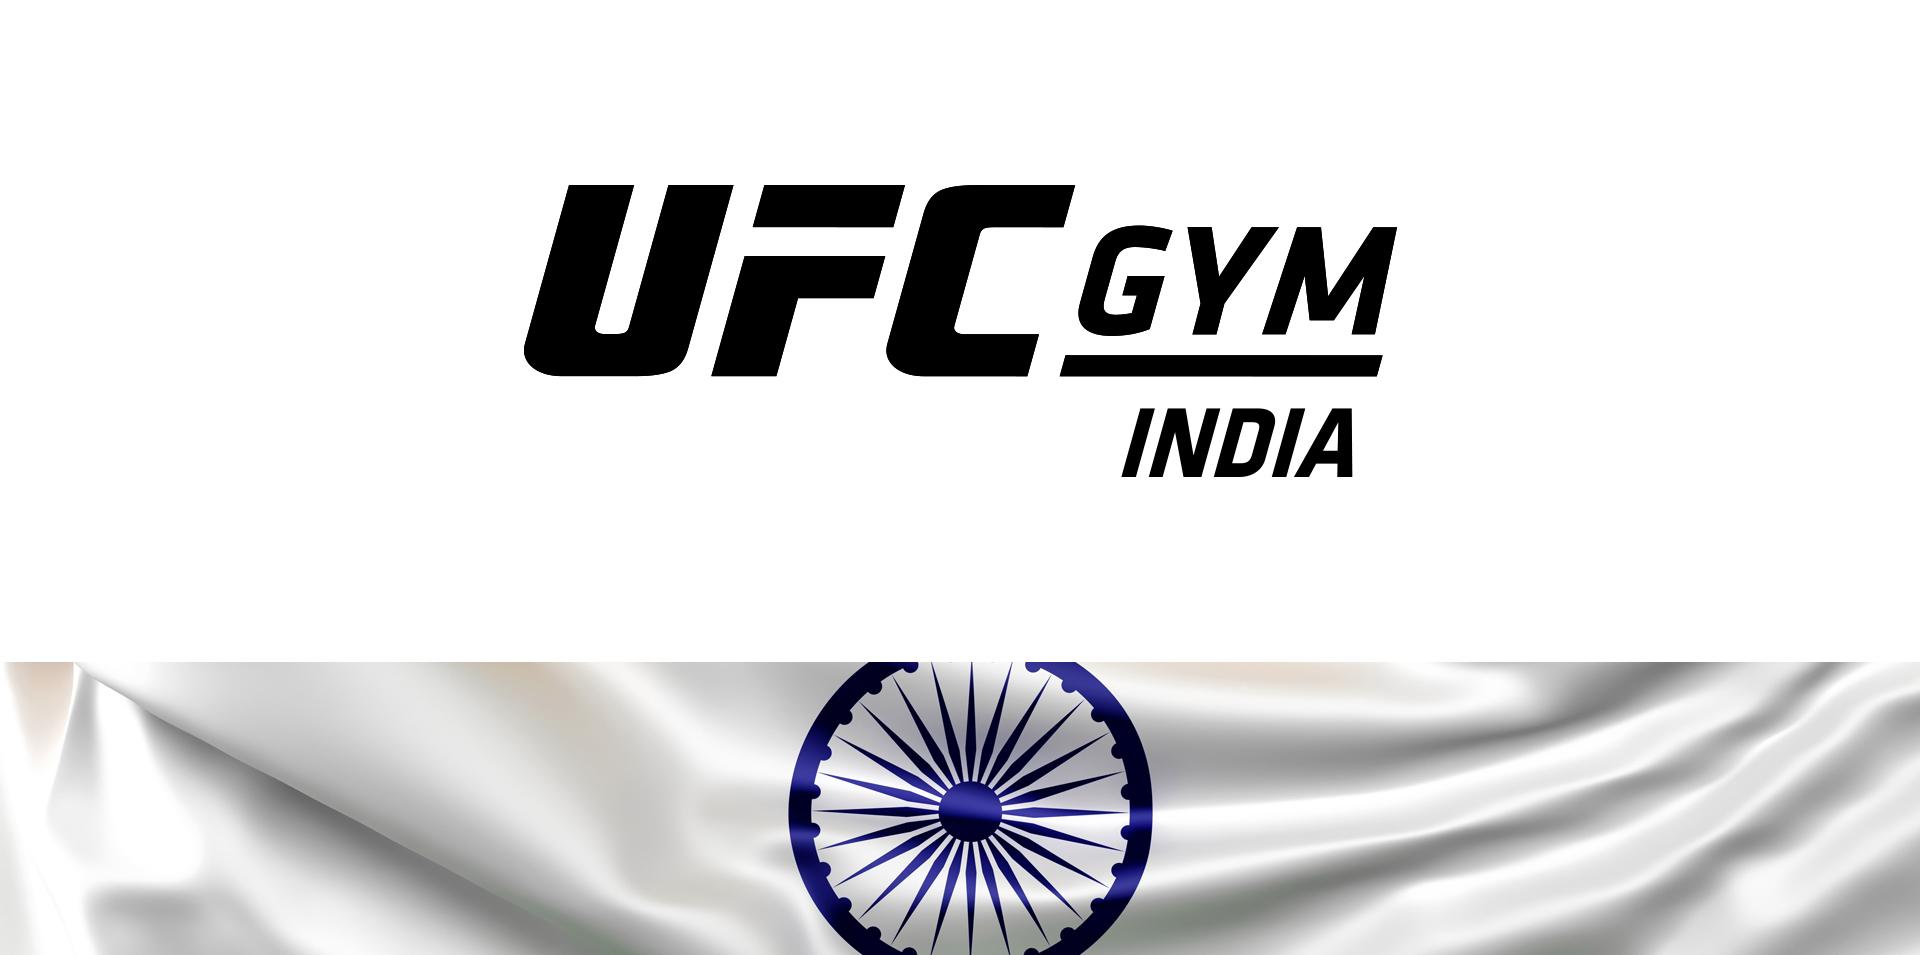 India Featured Image